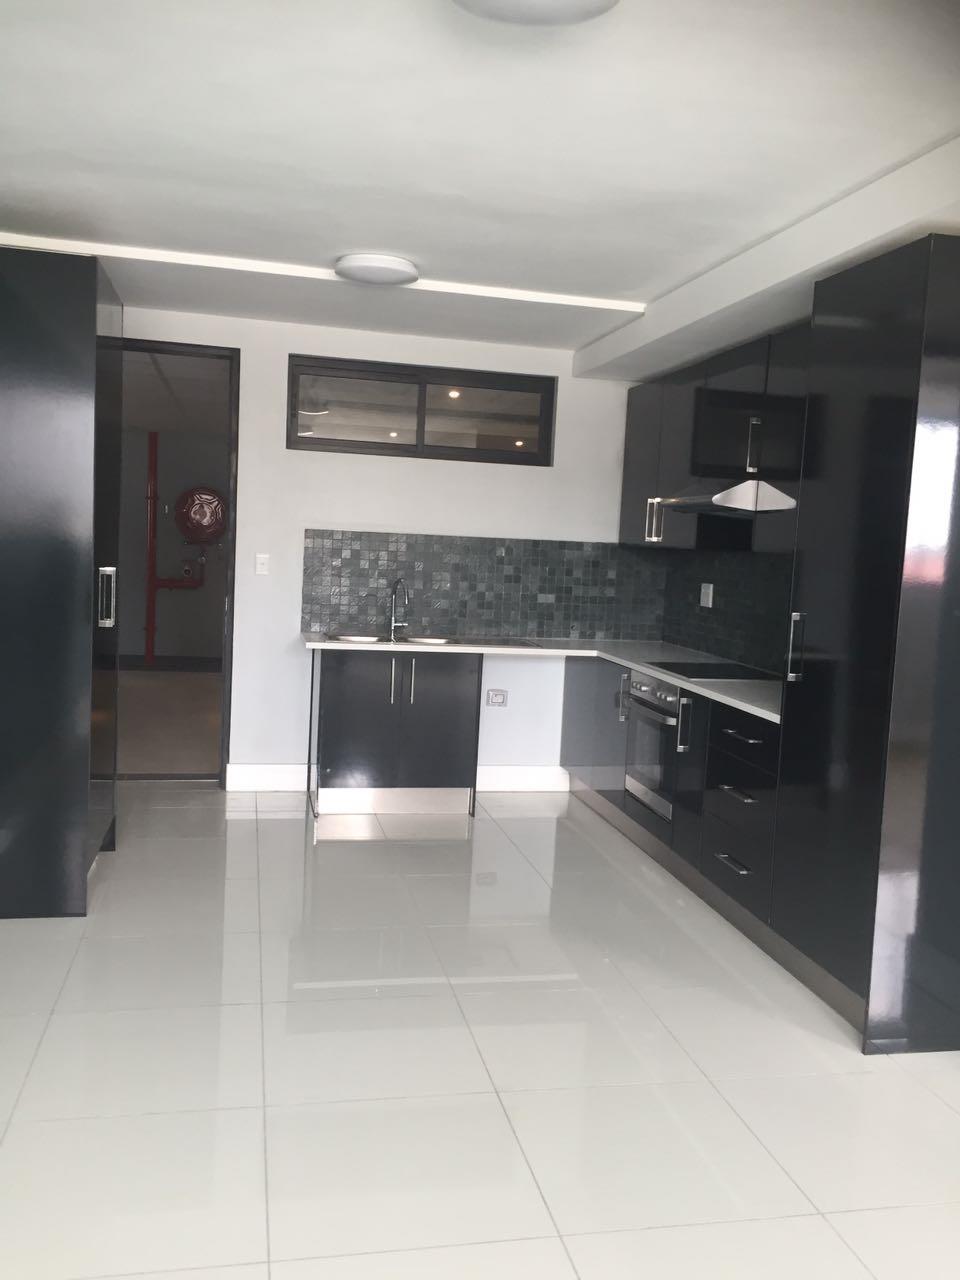 2 Bedroom Apartment / Flat To Rent in Windhoek Central